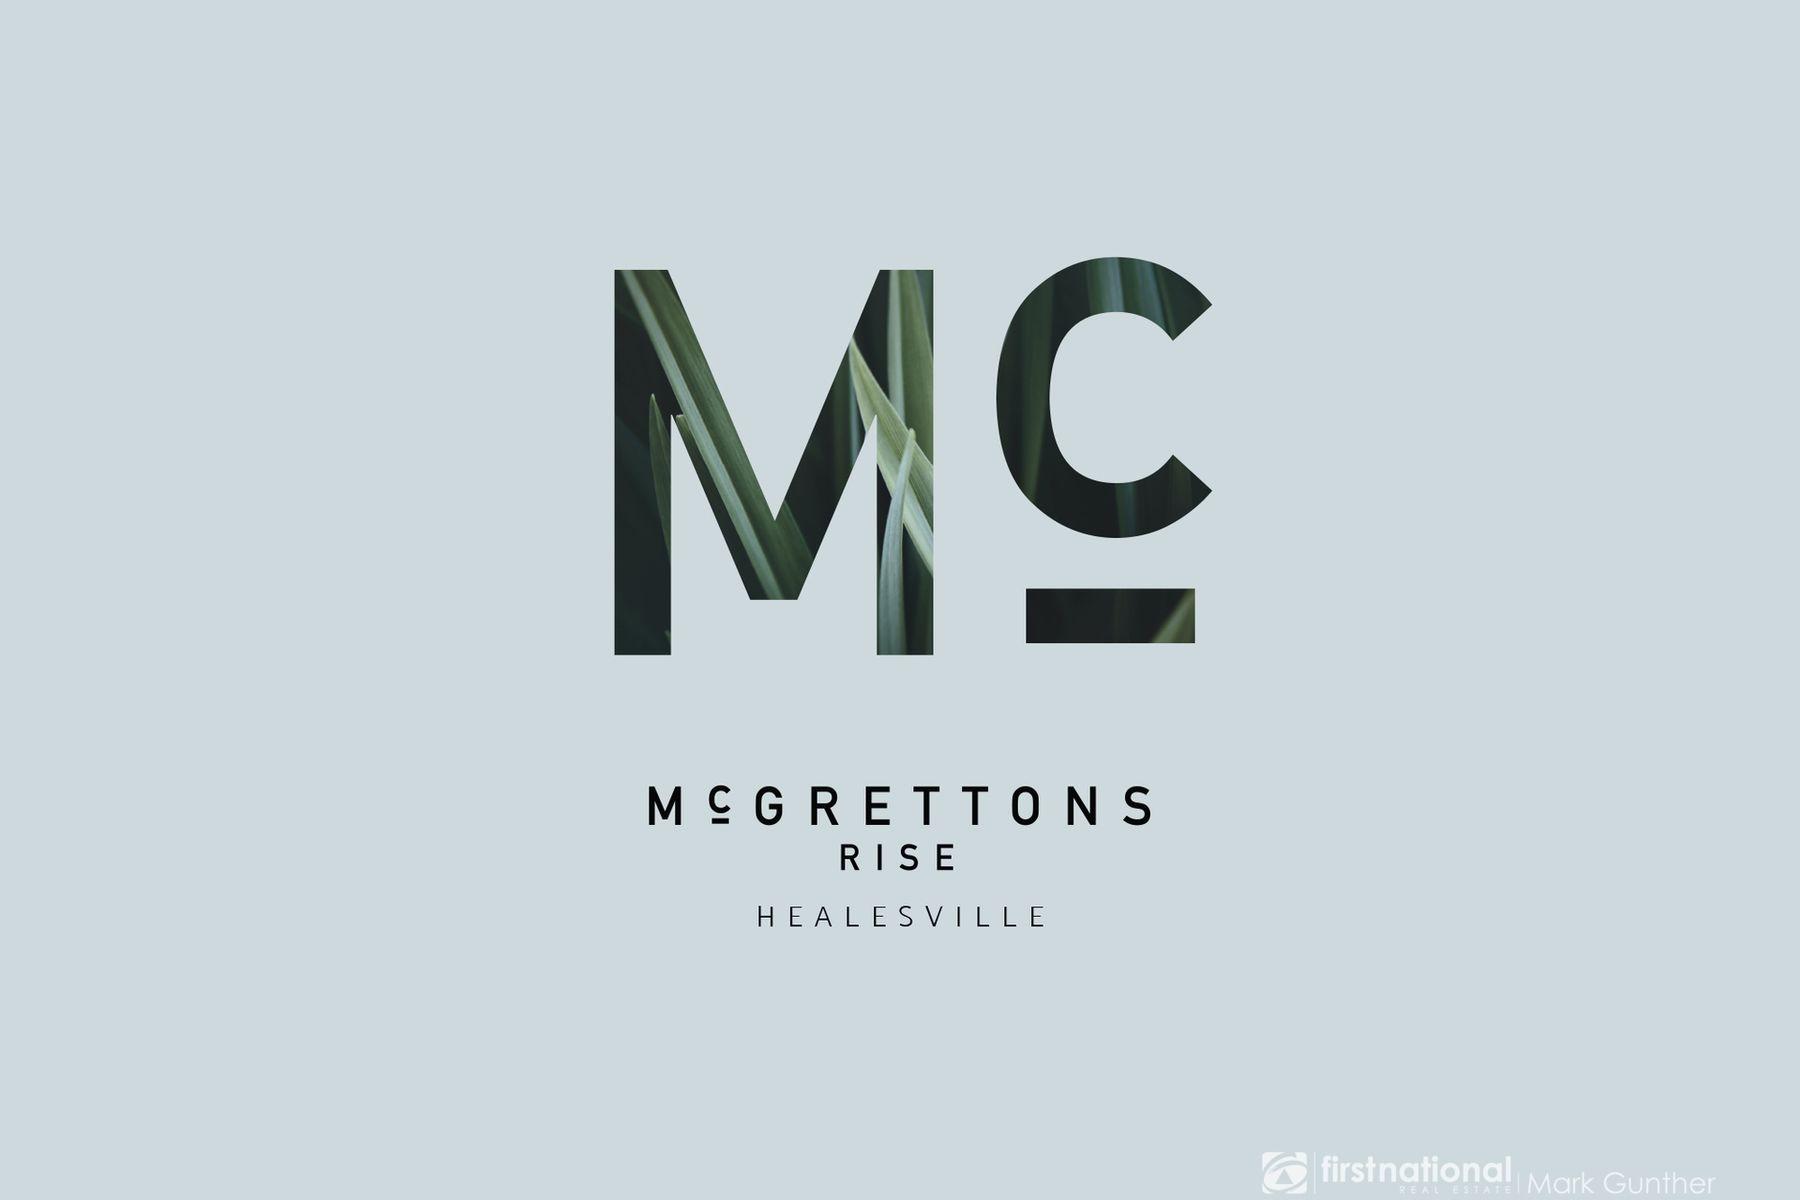 Lot 10/29 Mcgrettons Road, Healesville, VIC 3777